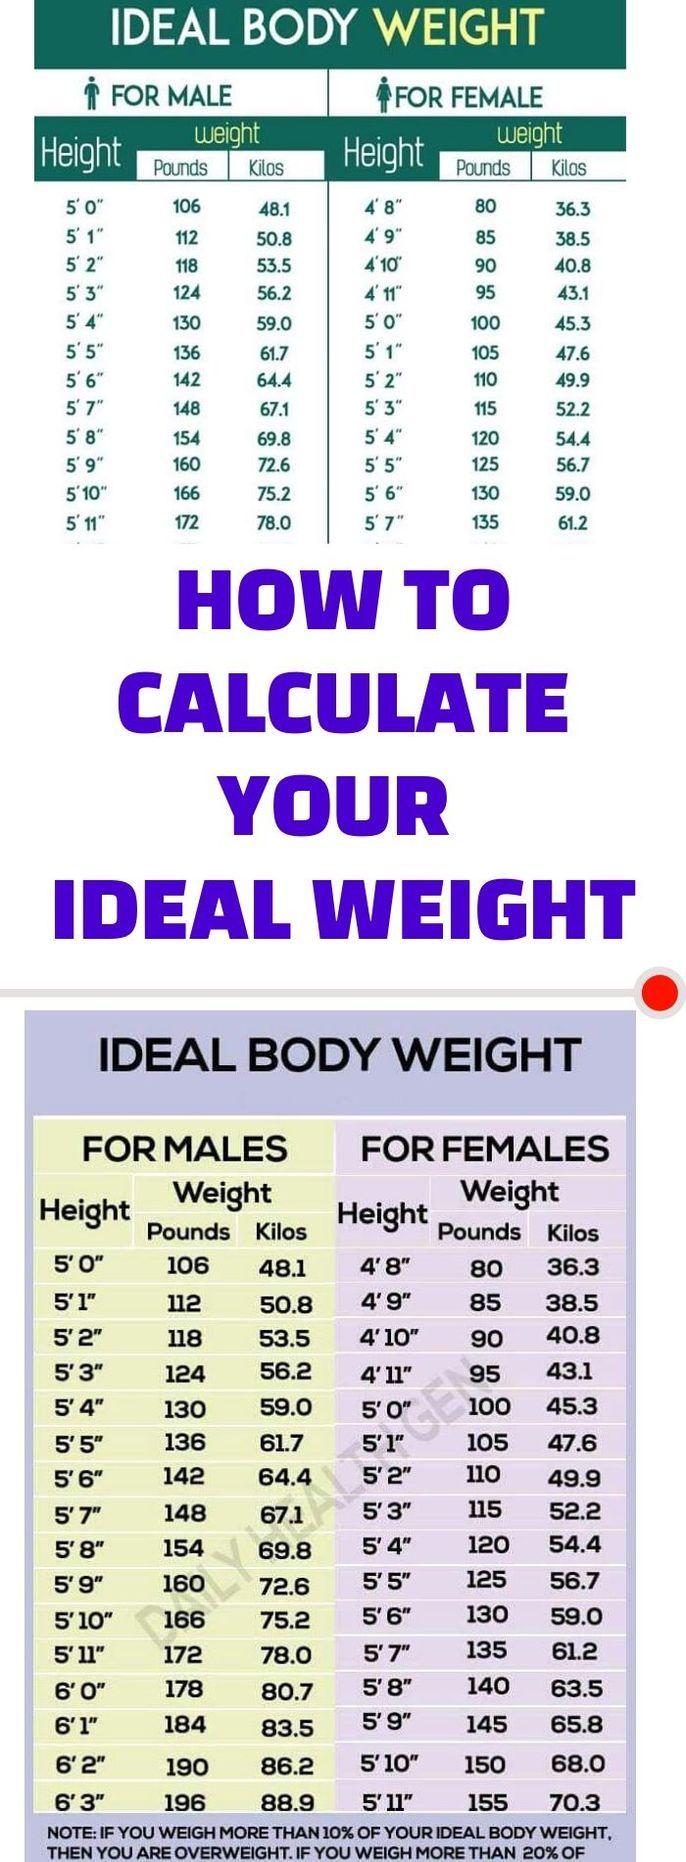 Ideal Body Weight Calculator Ideal Body Weight Ideal Body Body Weight